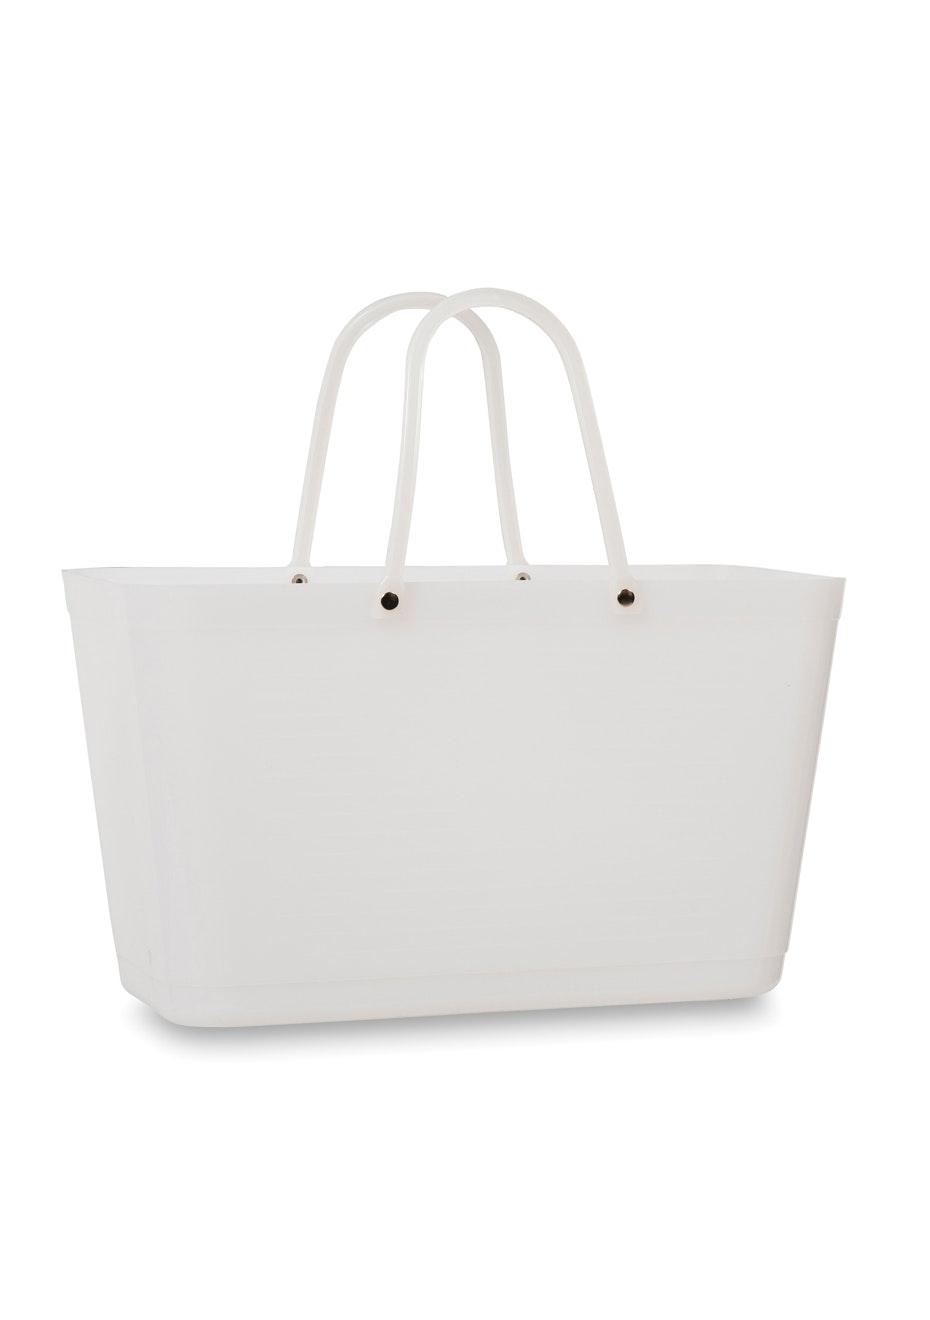 Città - Hinza Market Bag Clear 37x15x25cmh